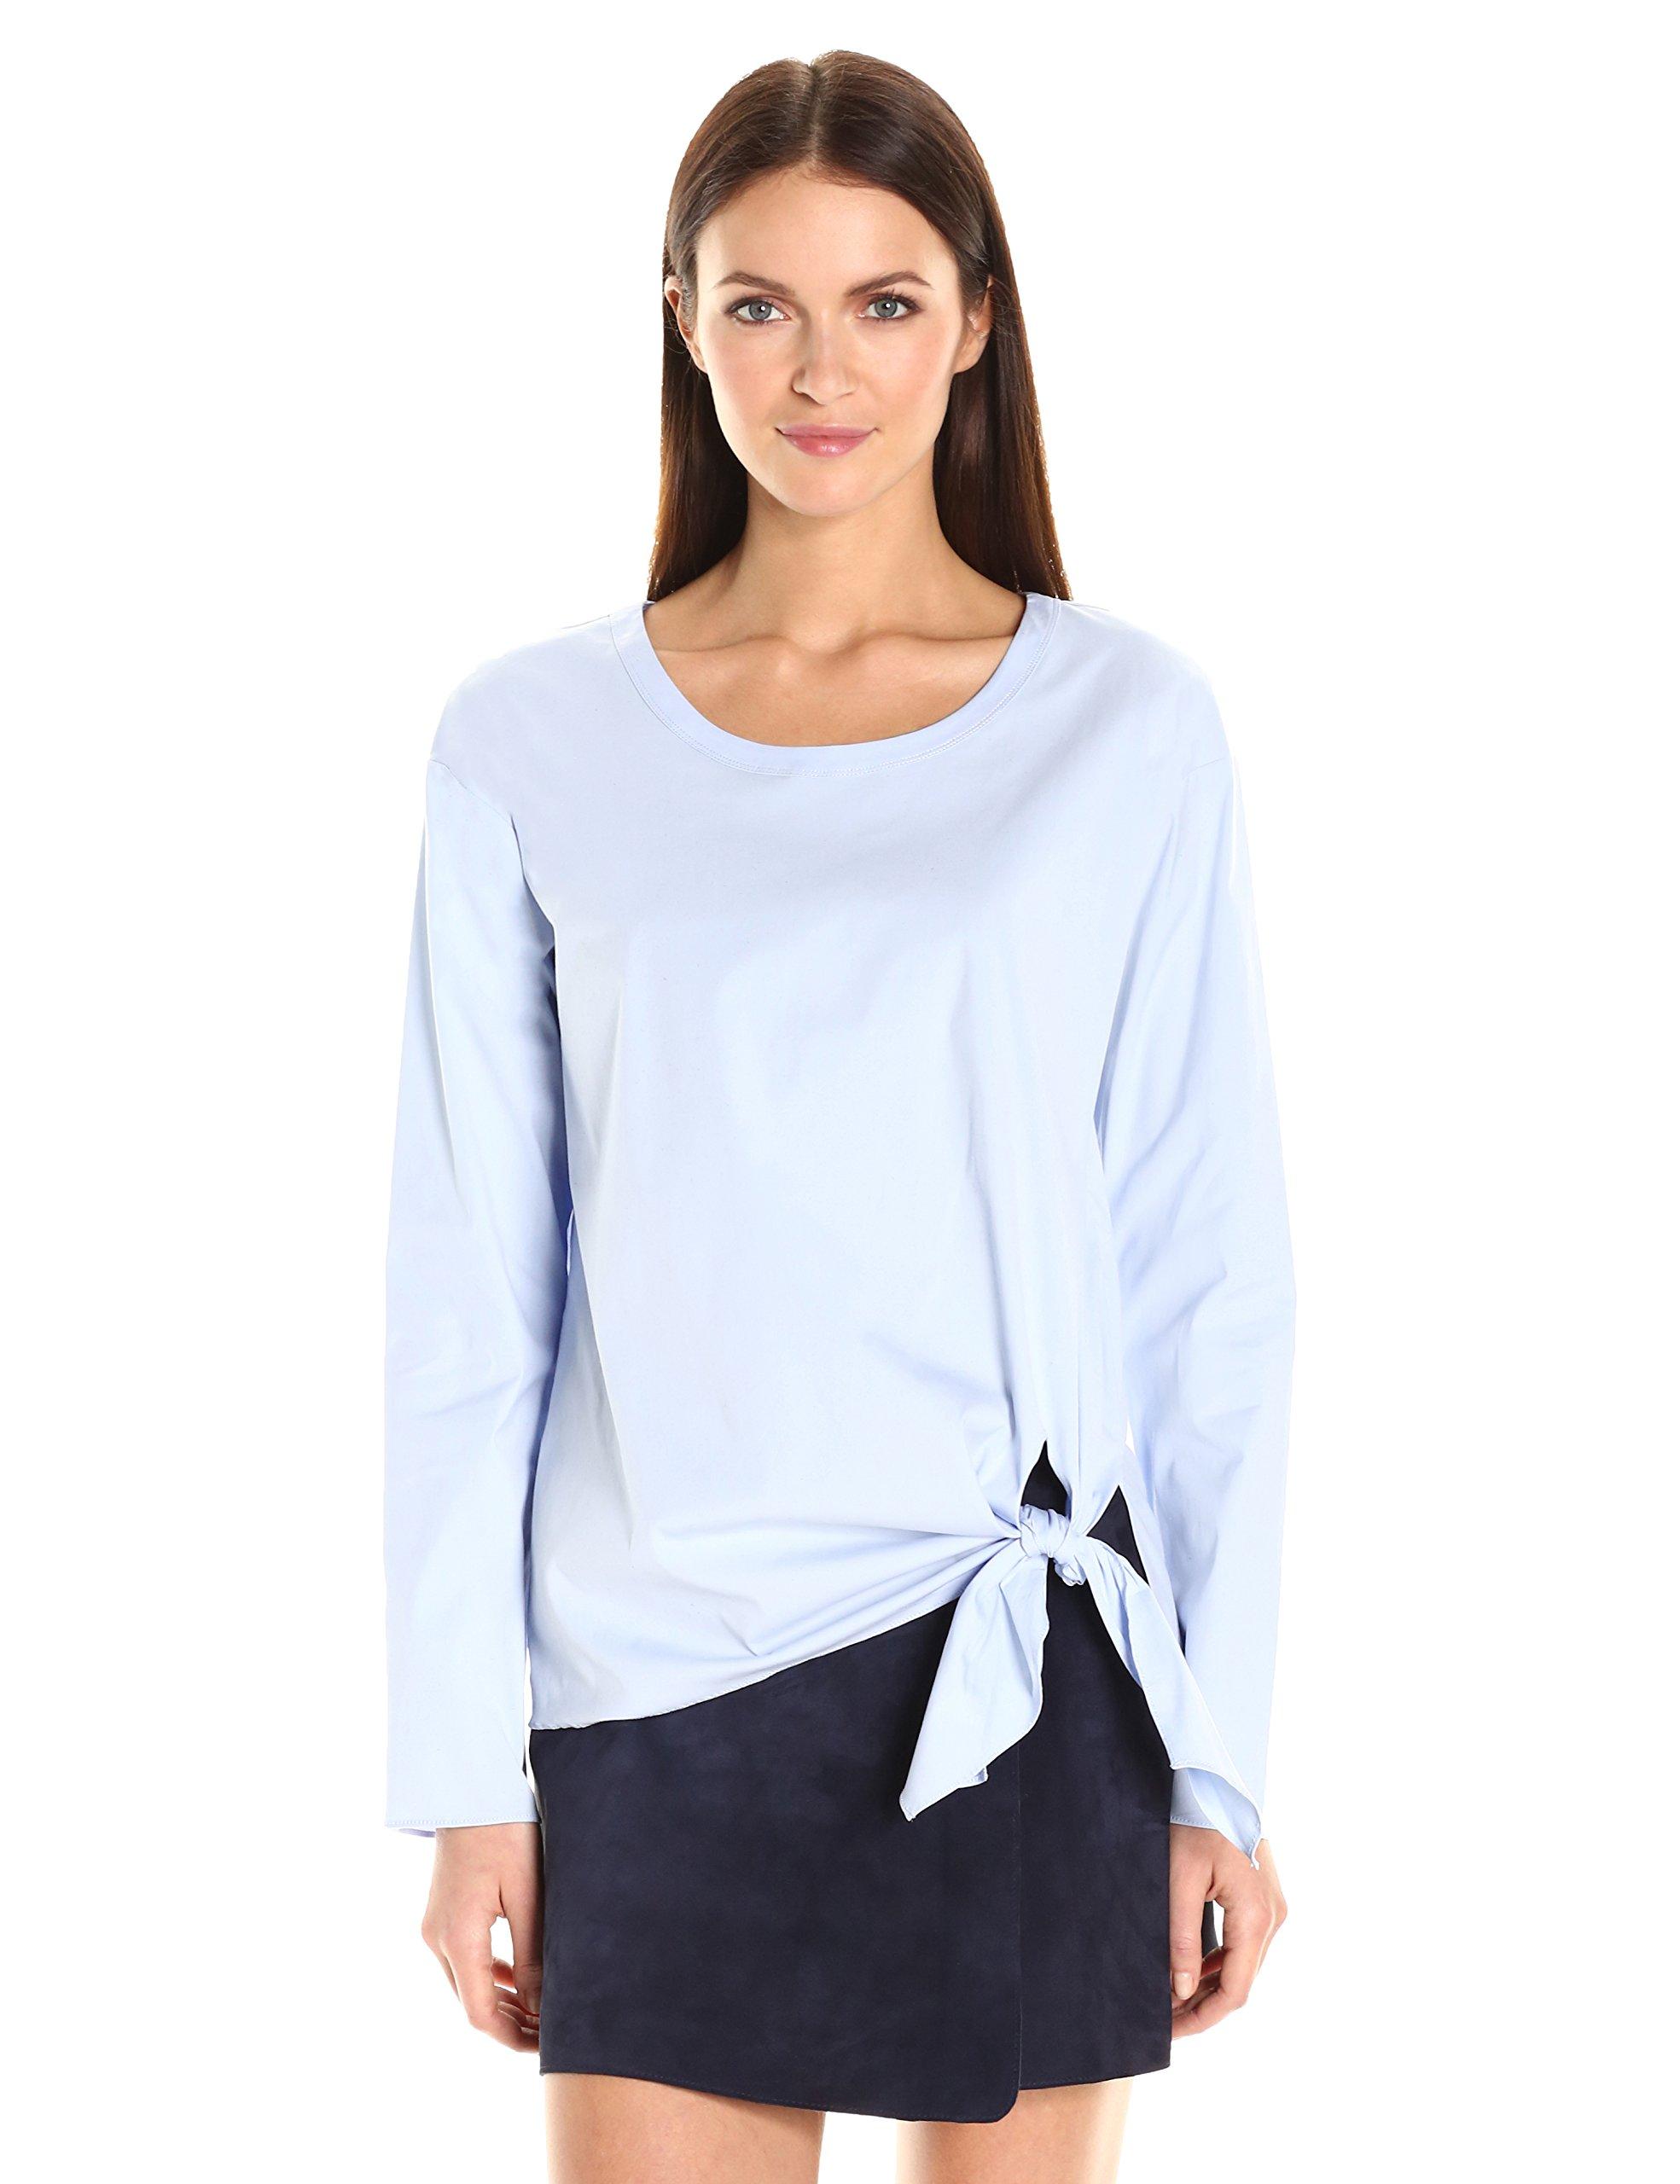 Theory Women's Serah Stretch Cotton Top, Larkspur, M